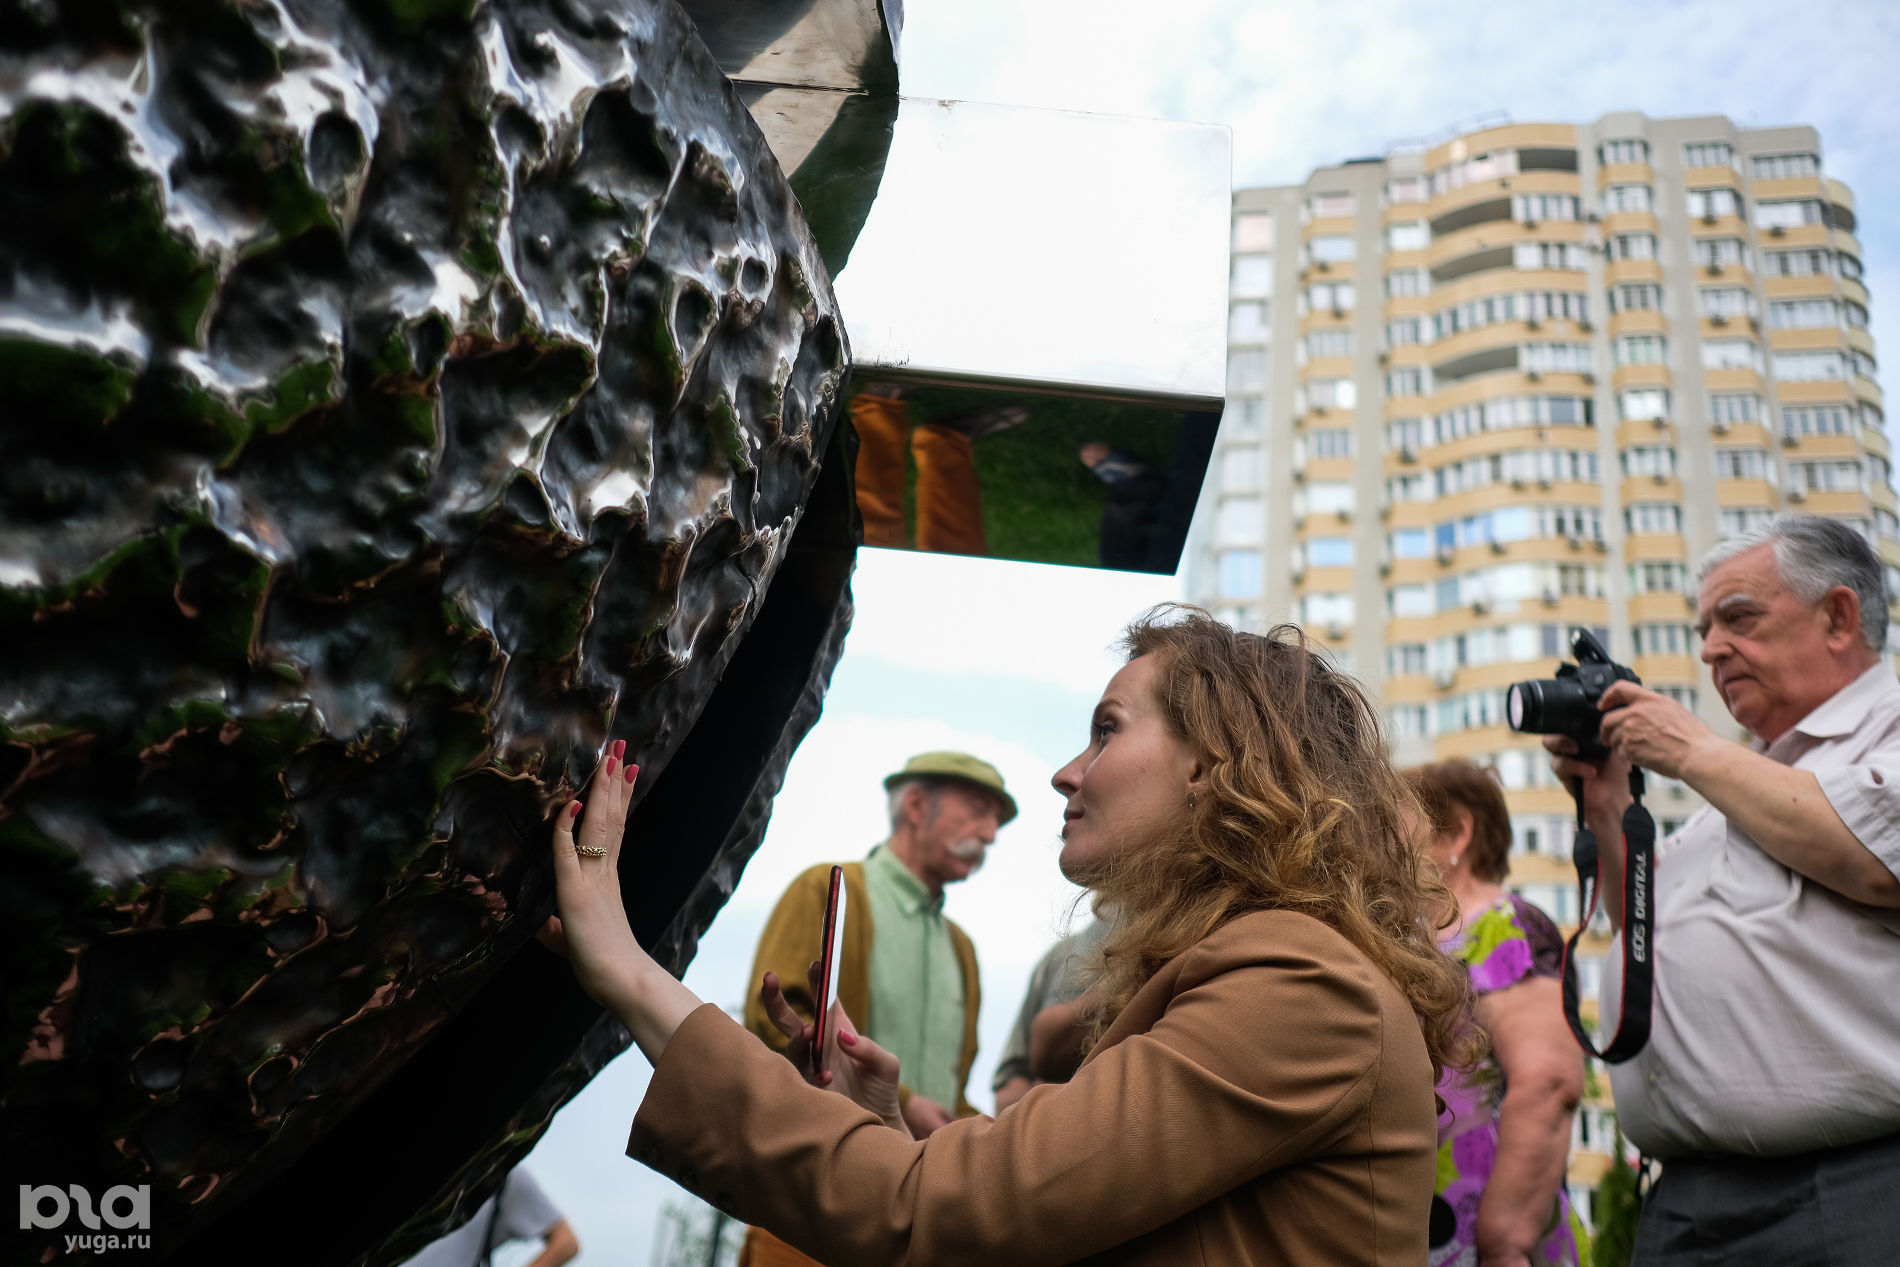 Скульптура «Точка» ©Фото Антона Быкова, Юга.ру